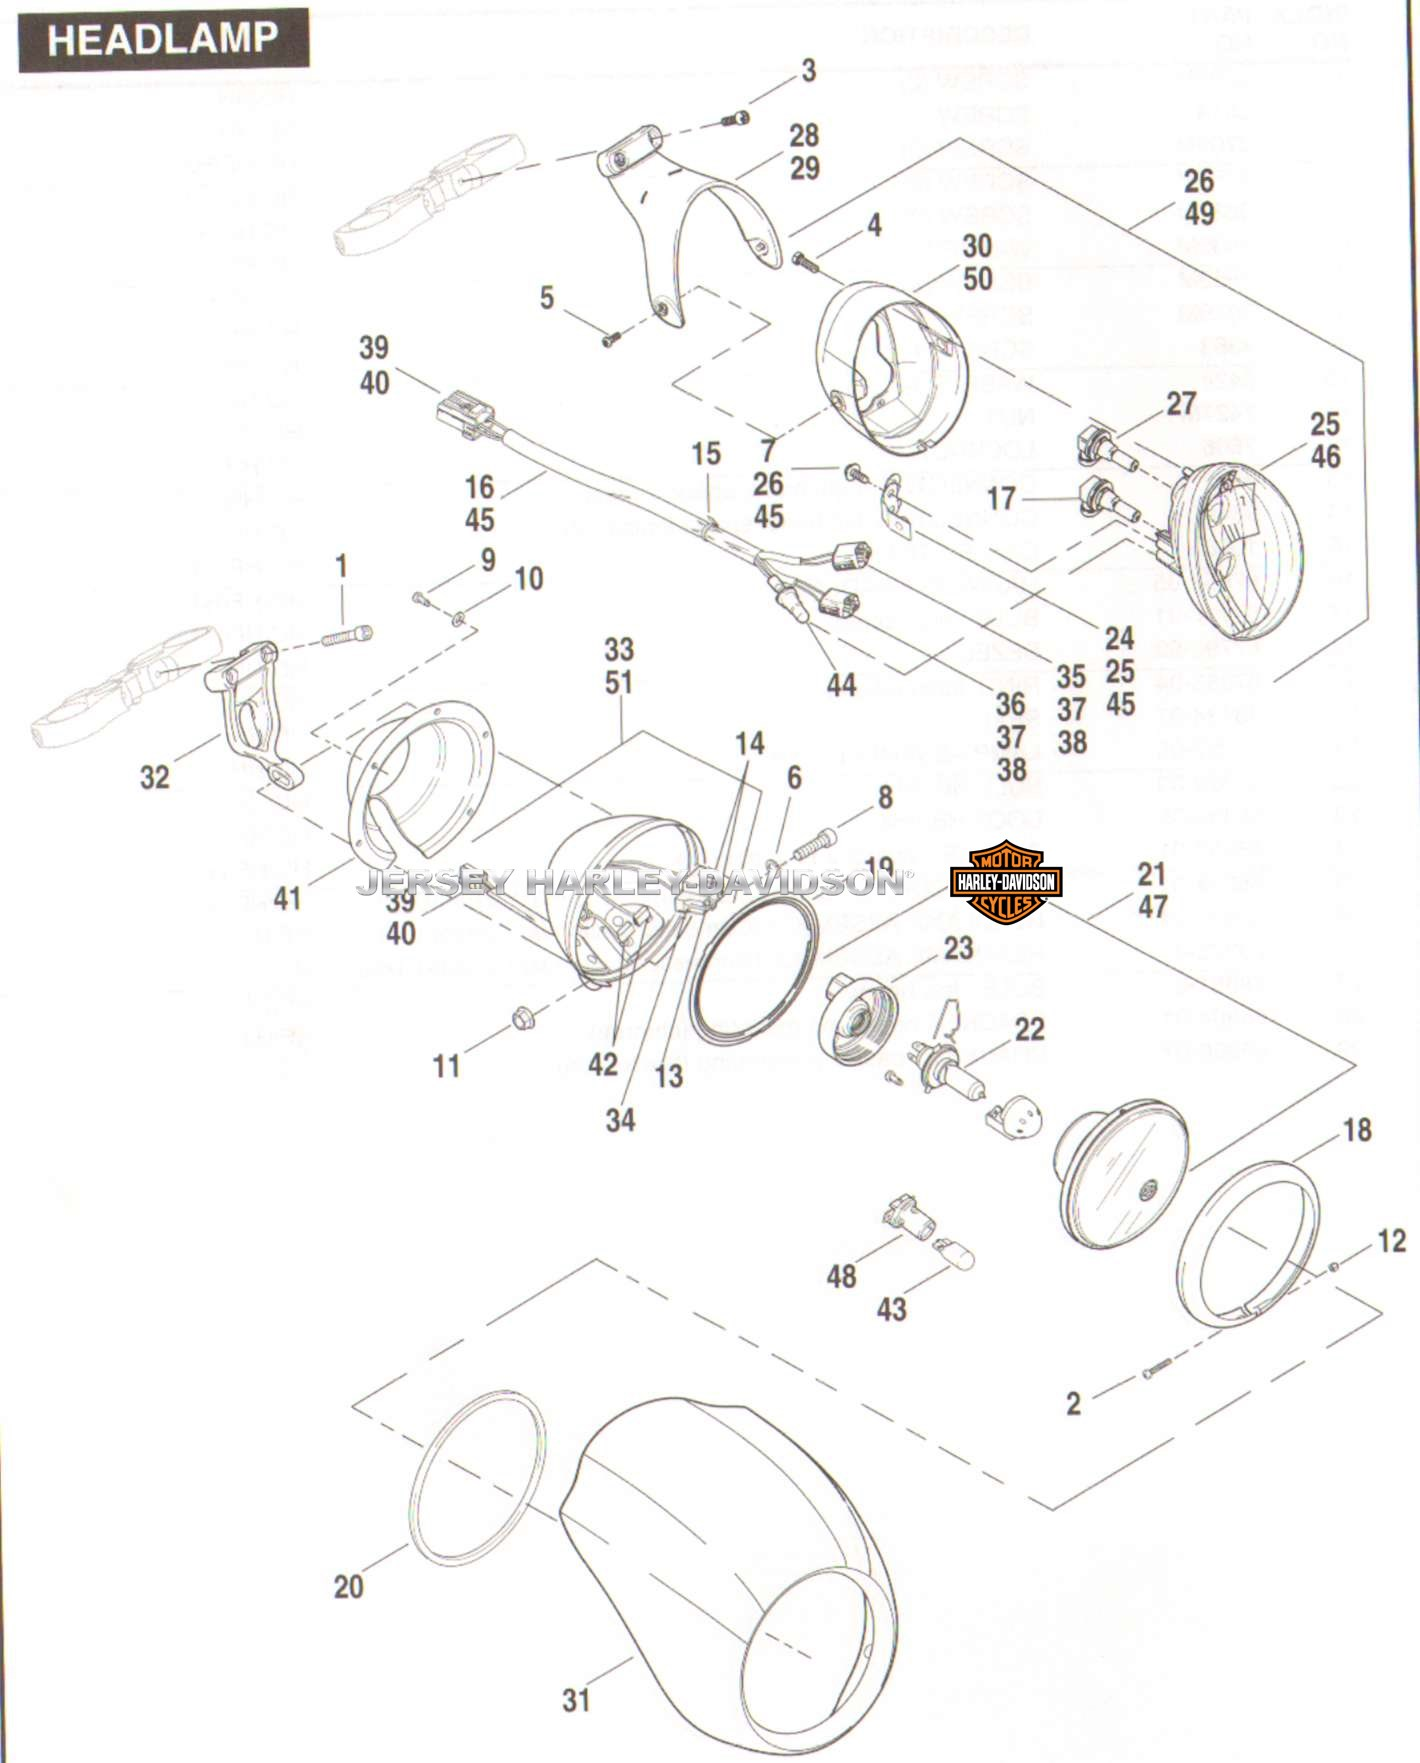 2003 harley softail wiring diagram html